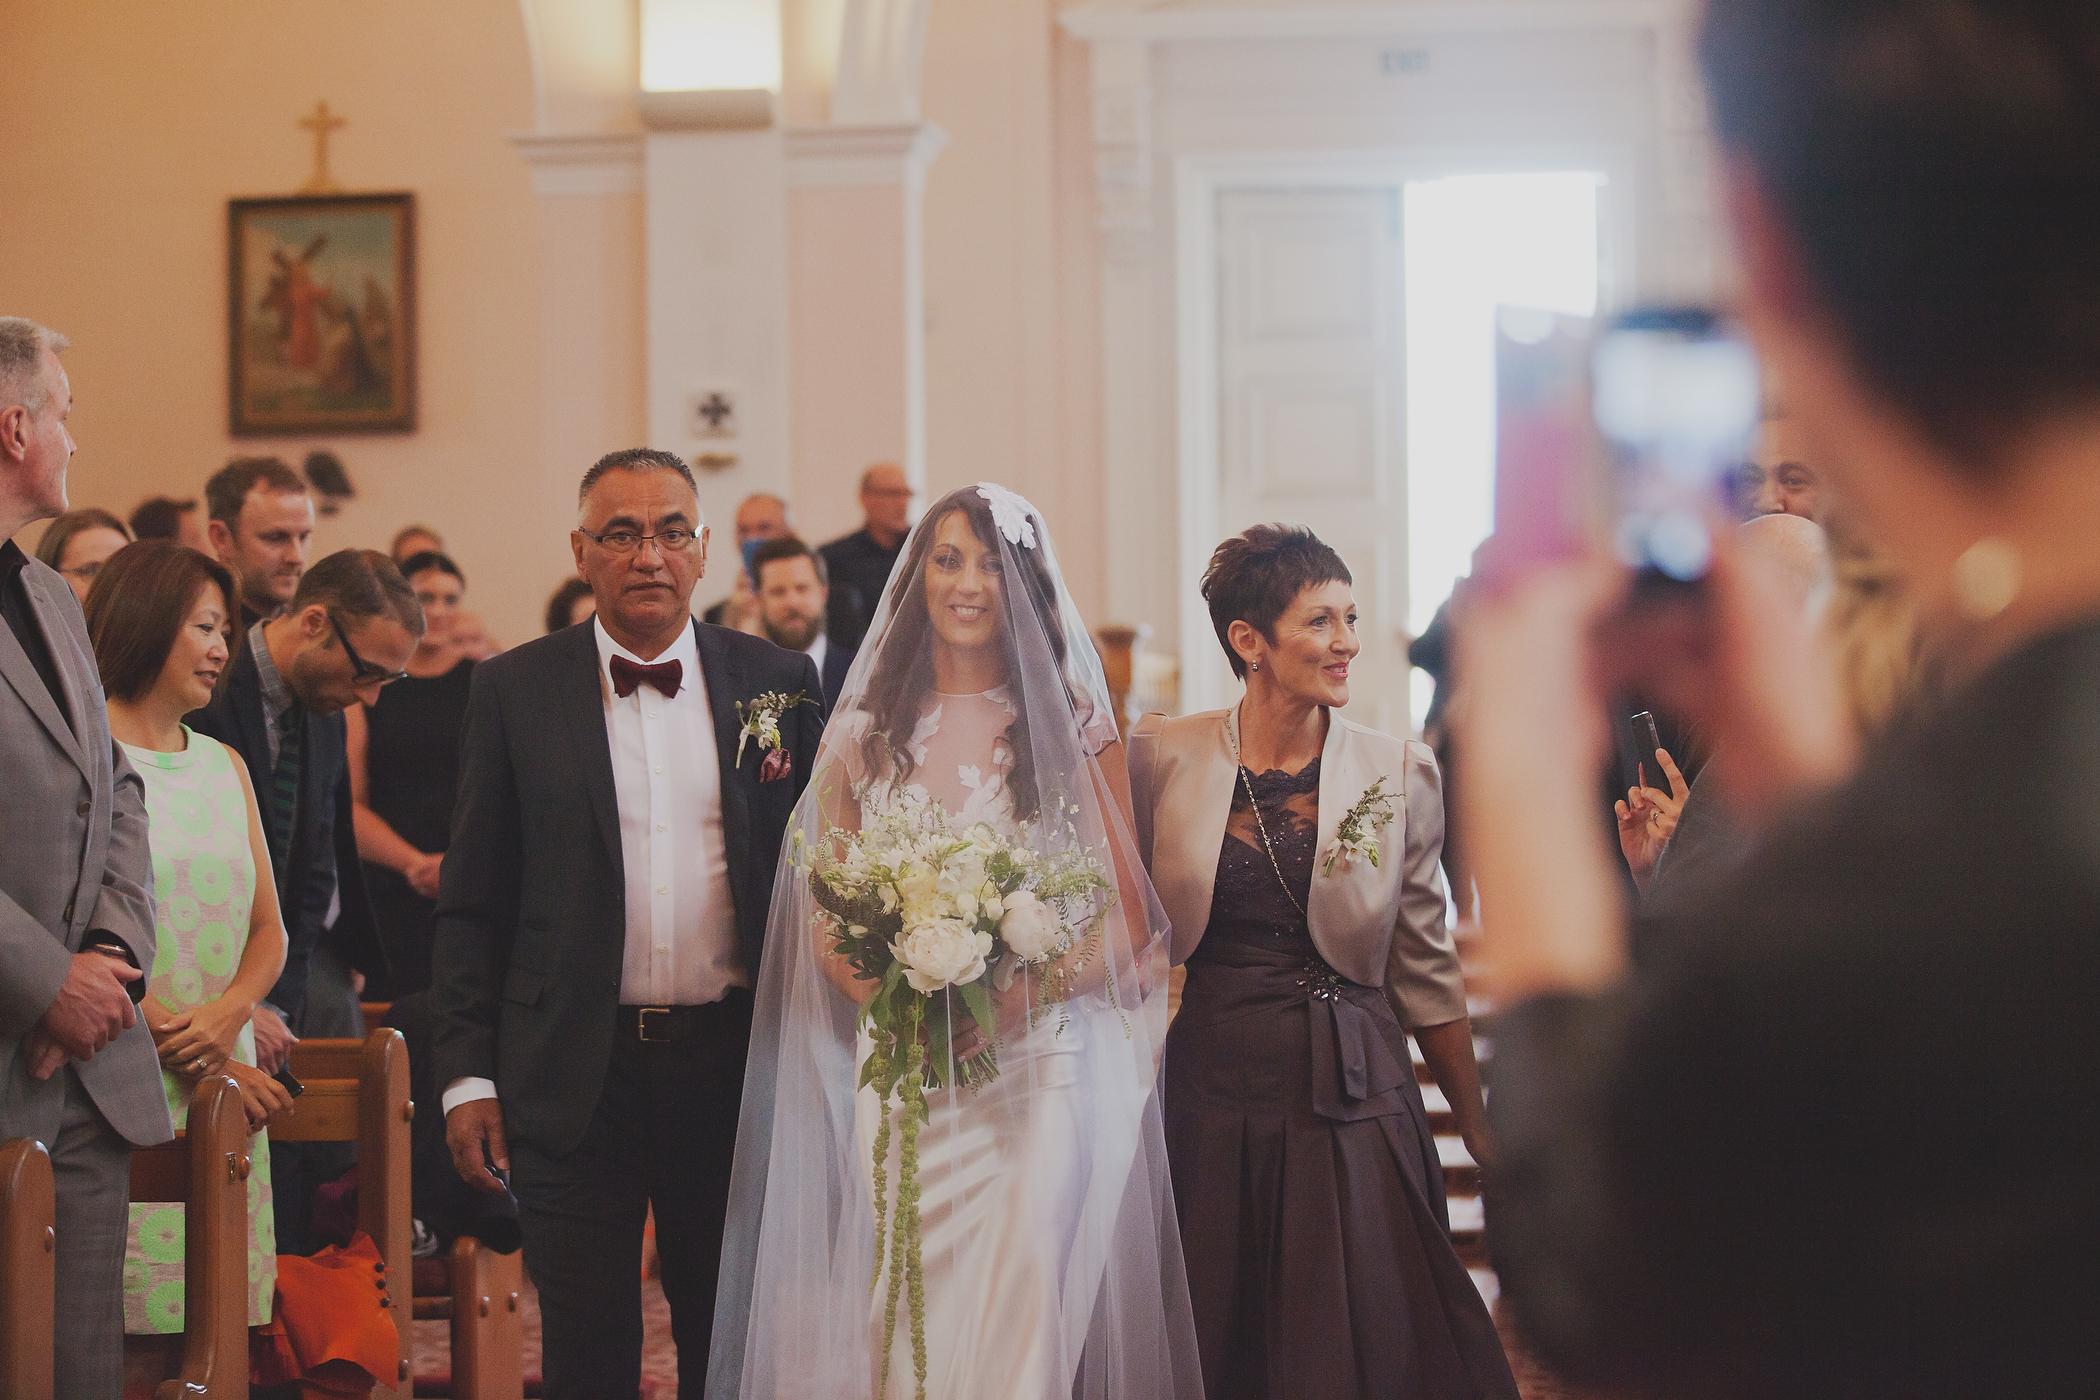 wellington wedding photography NZ - 1205.JPG